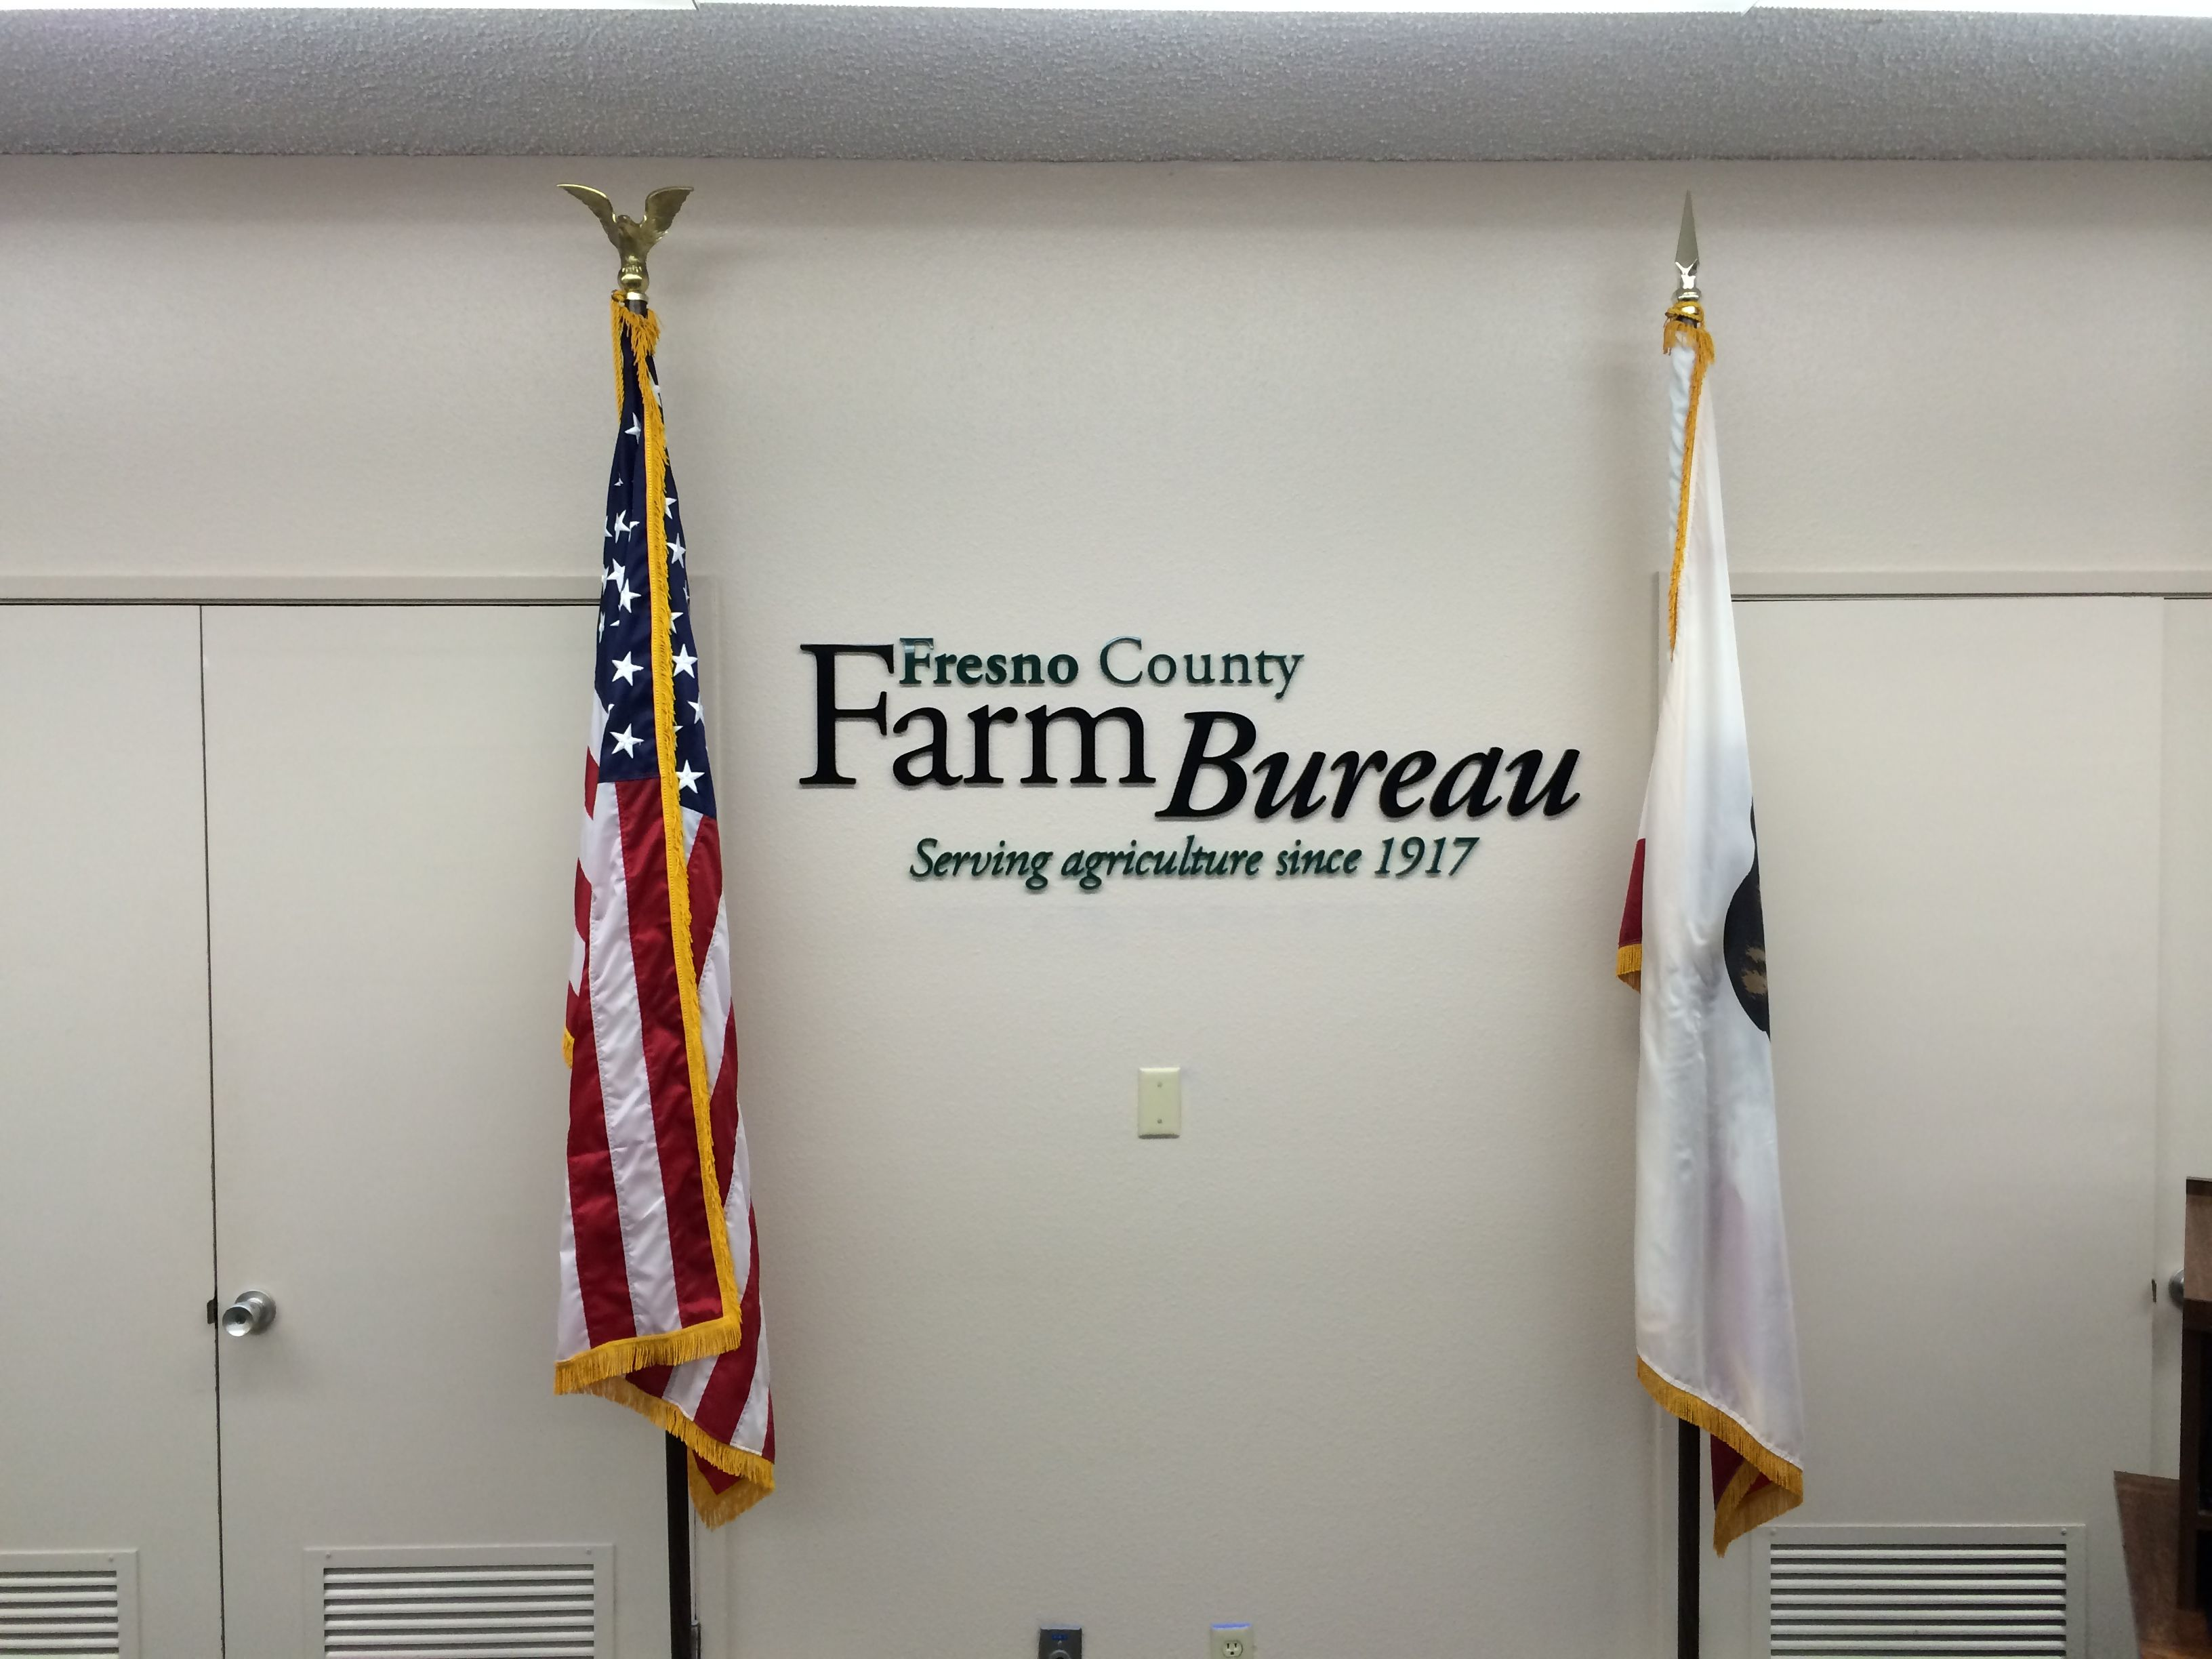 Fresno County Farm Bureau